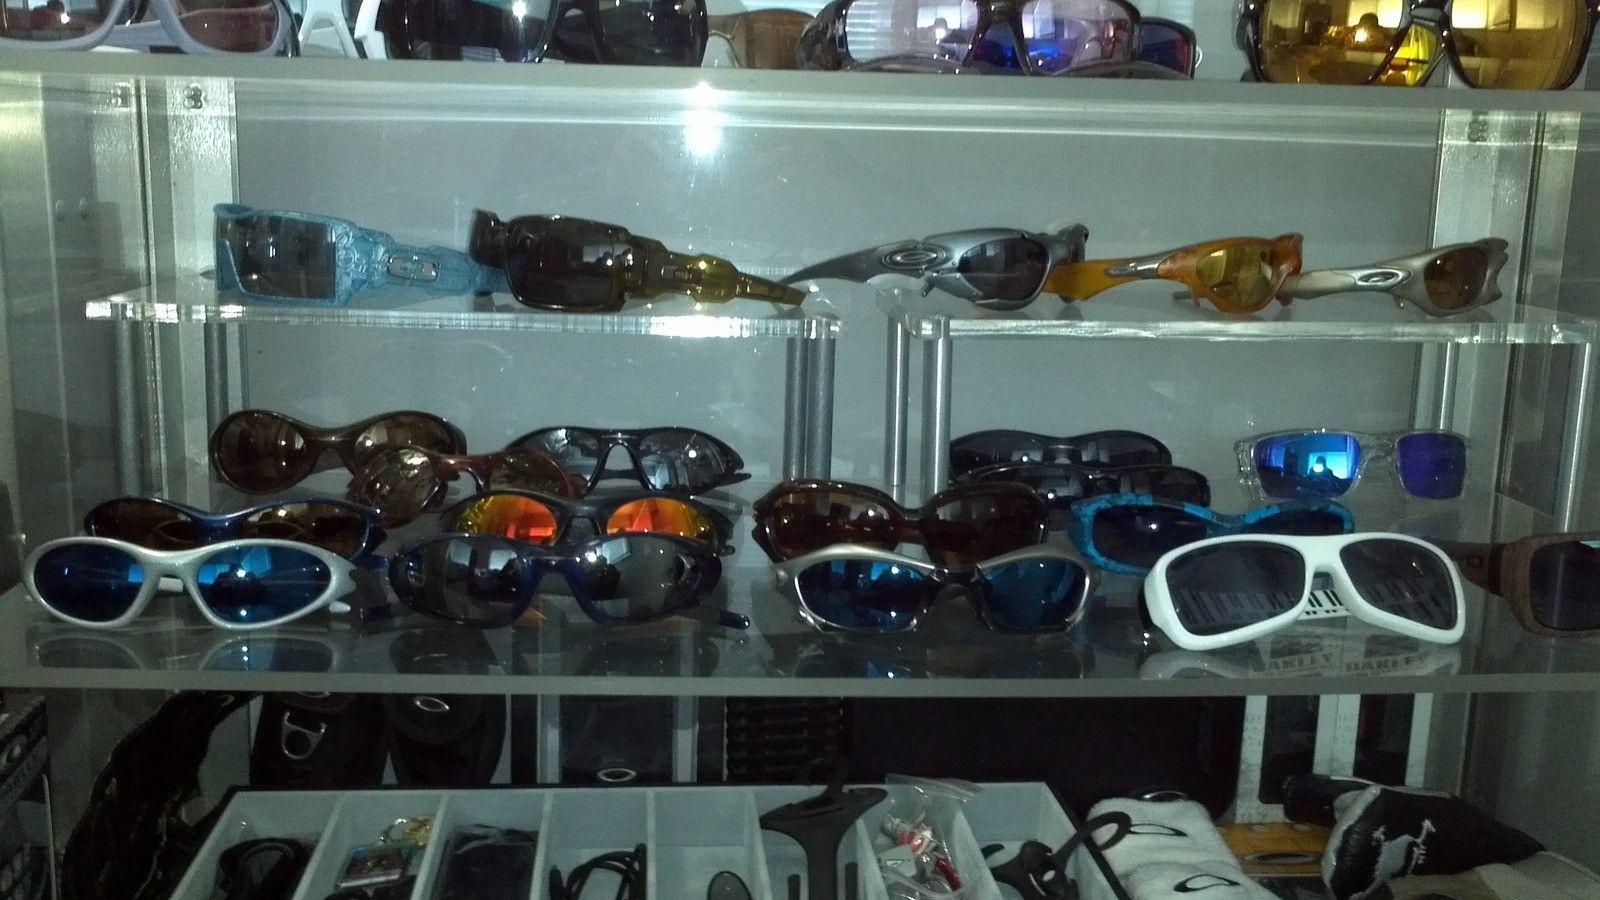 My Collection Setup - shelf4moreomatter.jpg